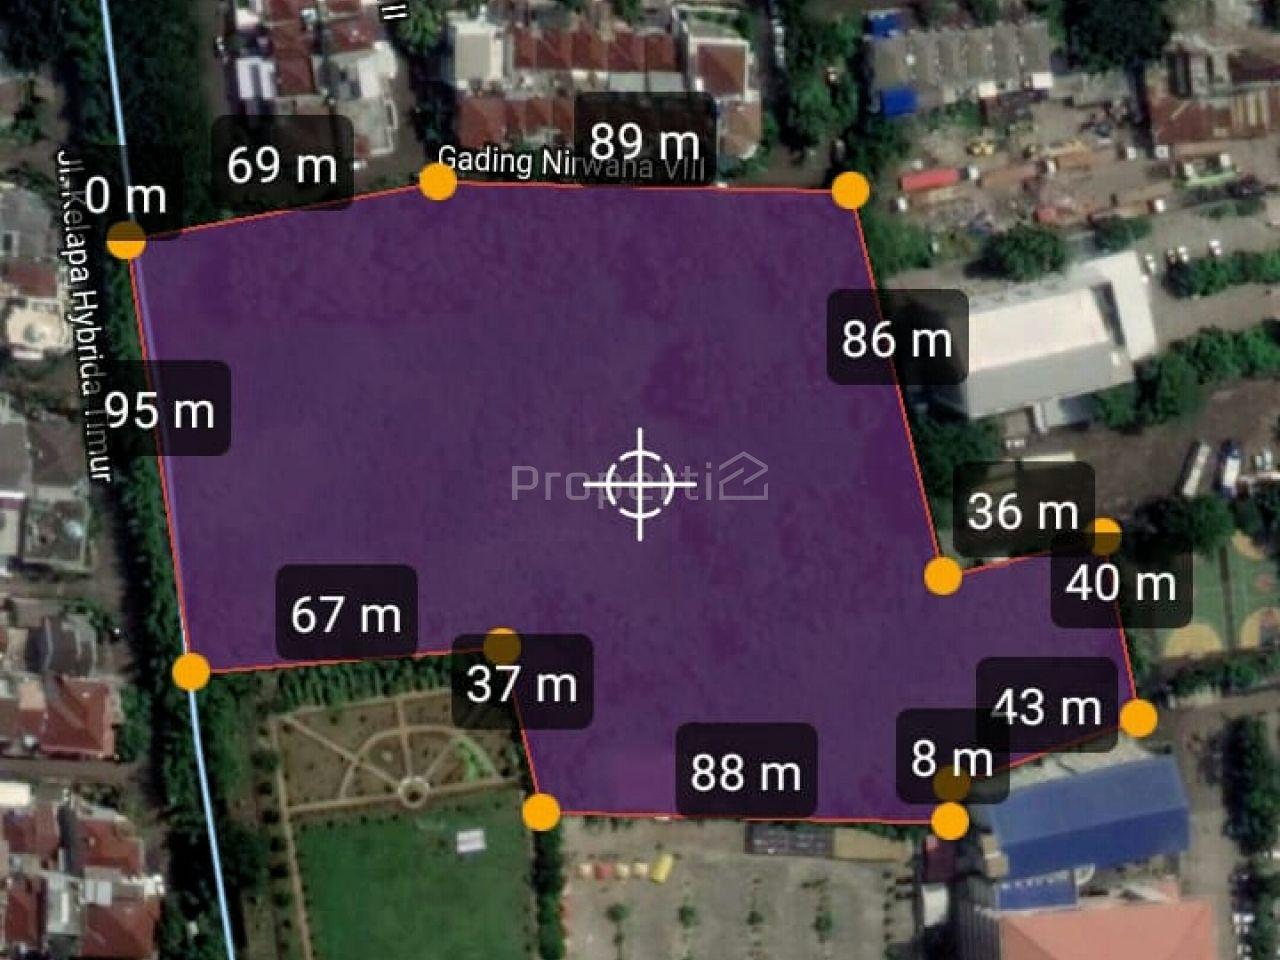 Lahan Peruntukan Perumahan dan Gudang di Kelapa Gading, Jakarta Utara